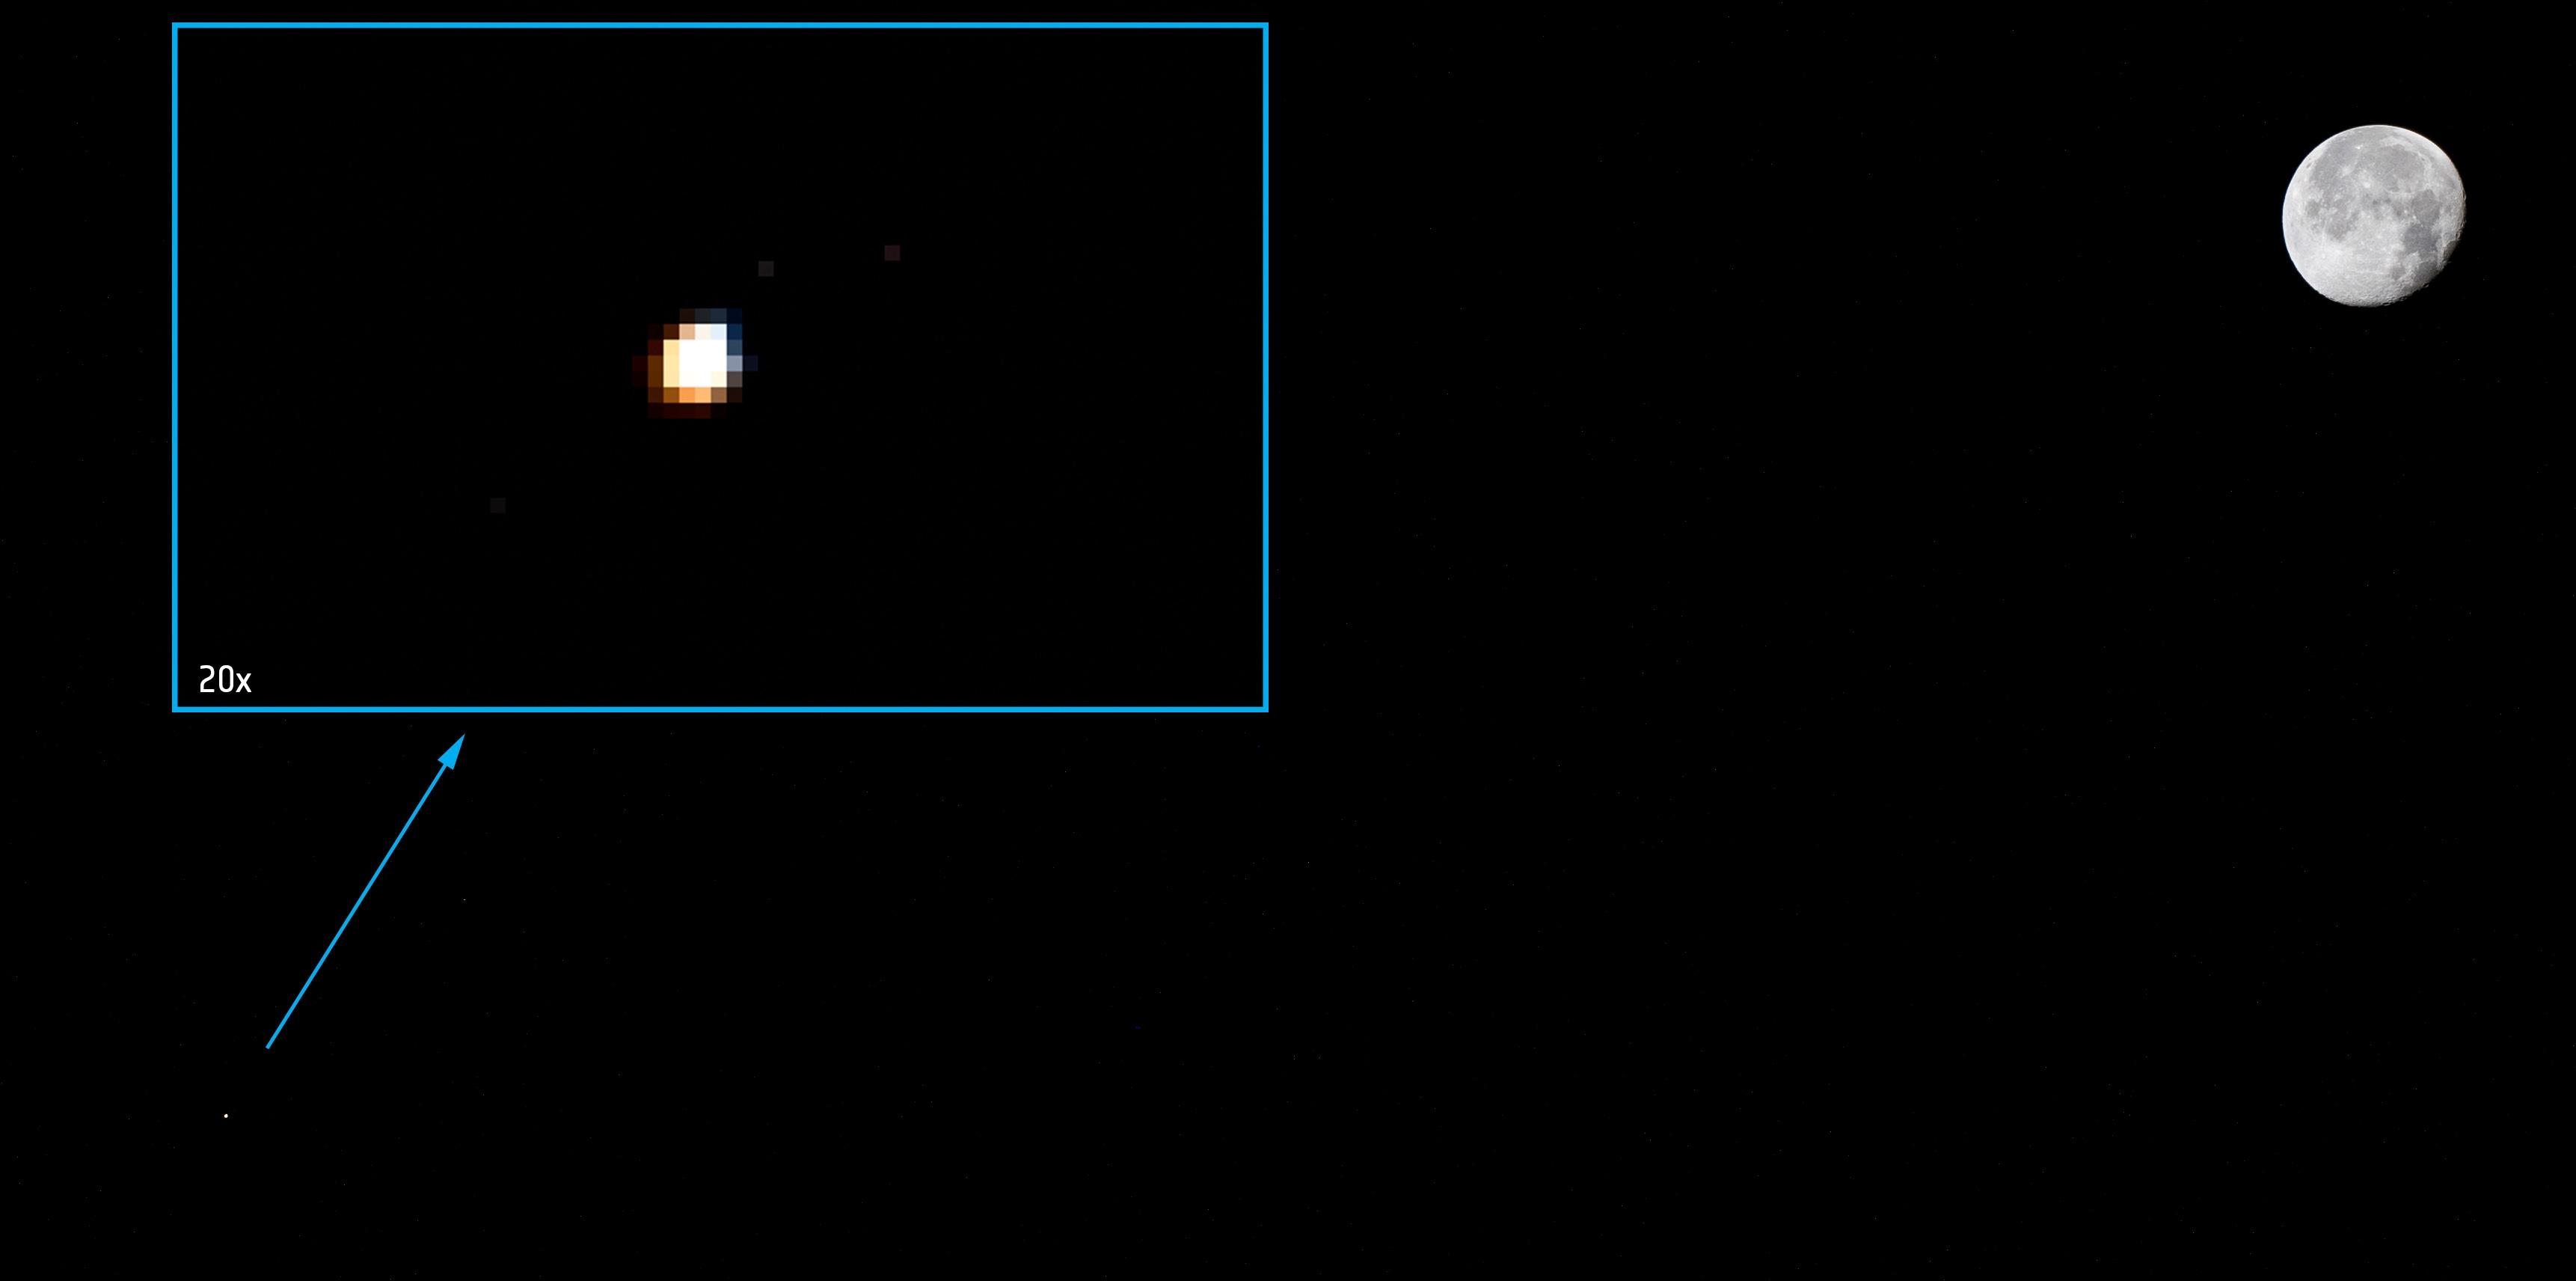 eclissi totale luna 27 luglio 2018 luna rossa - 2